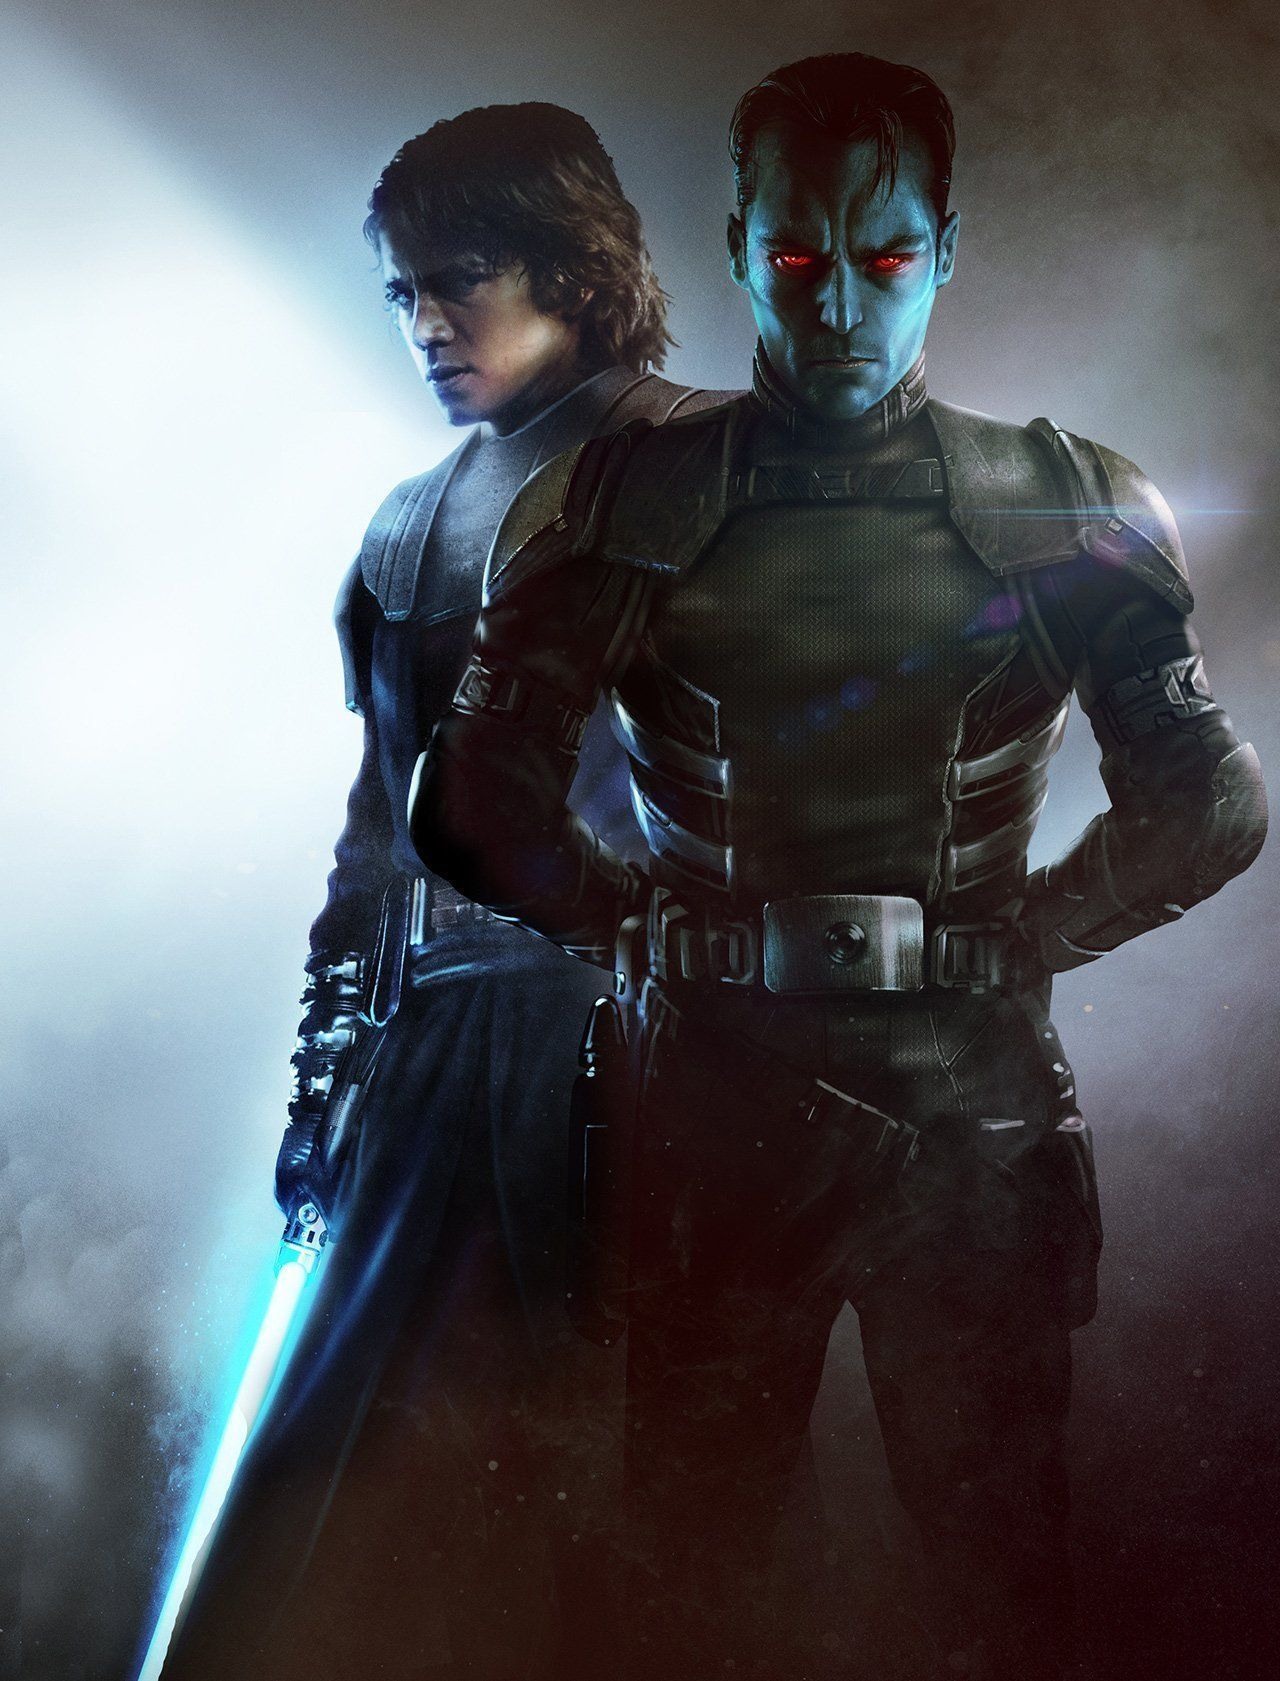 Anakin Skywalker iPhone Wallpapers - Top Free Anakin ...